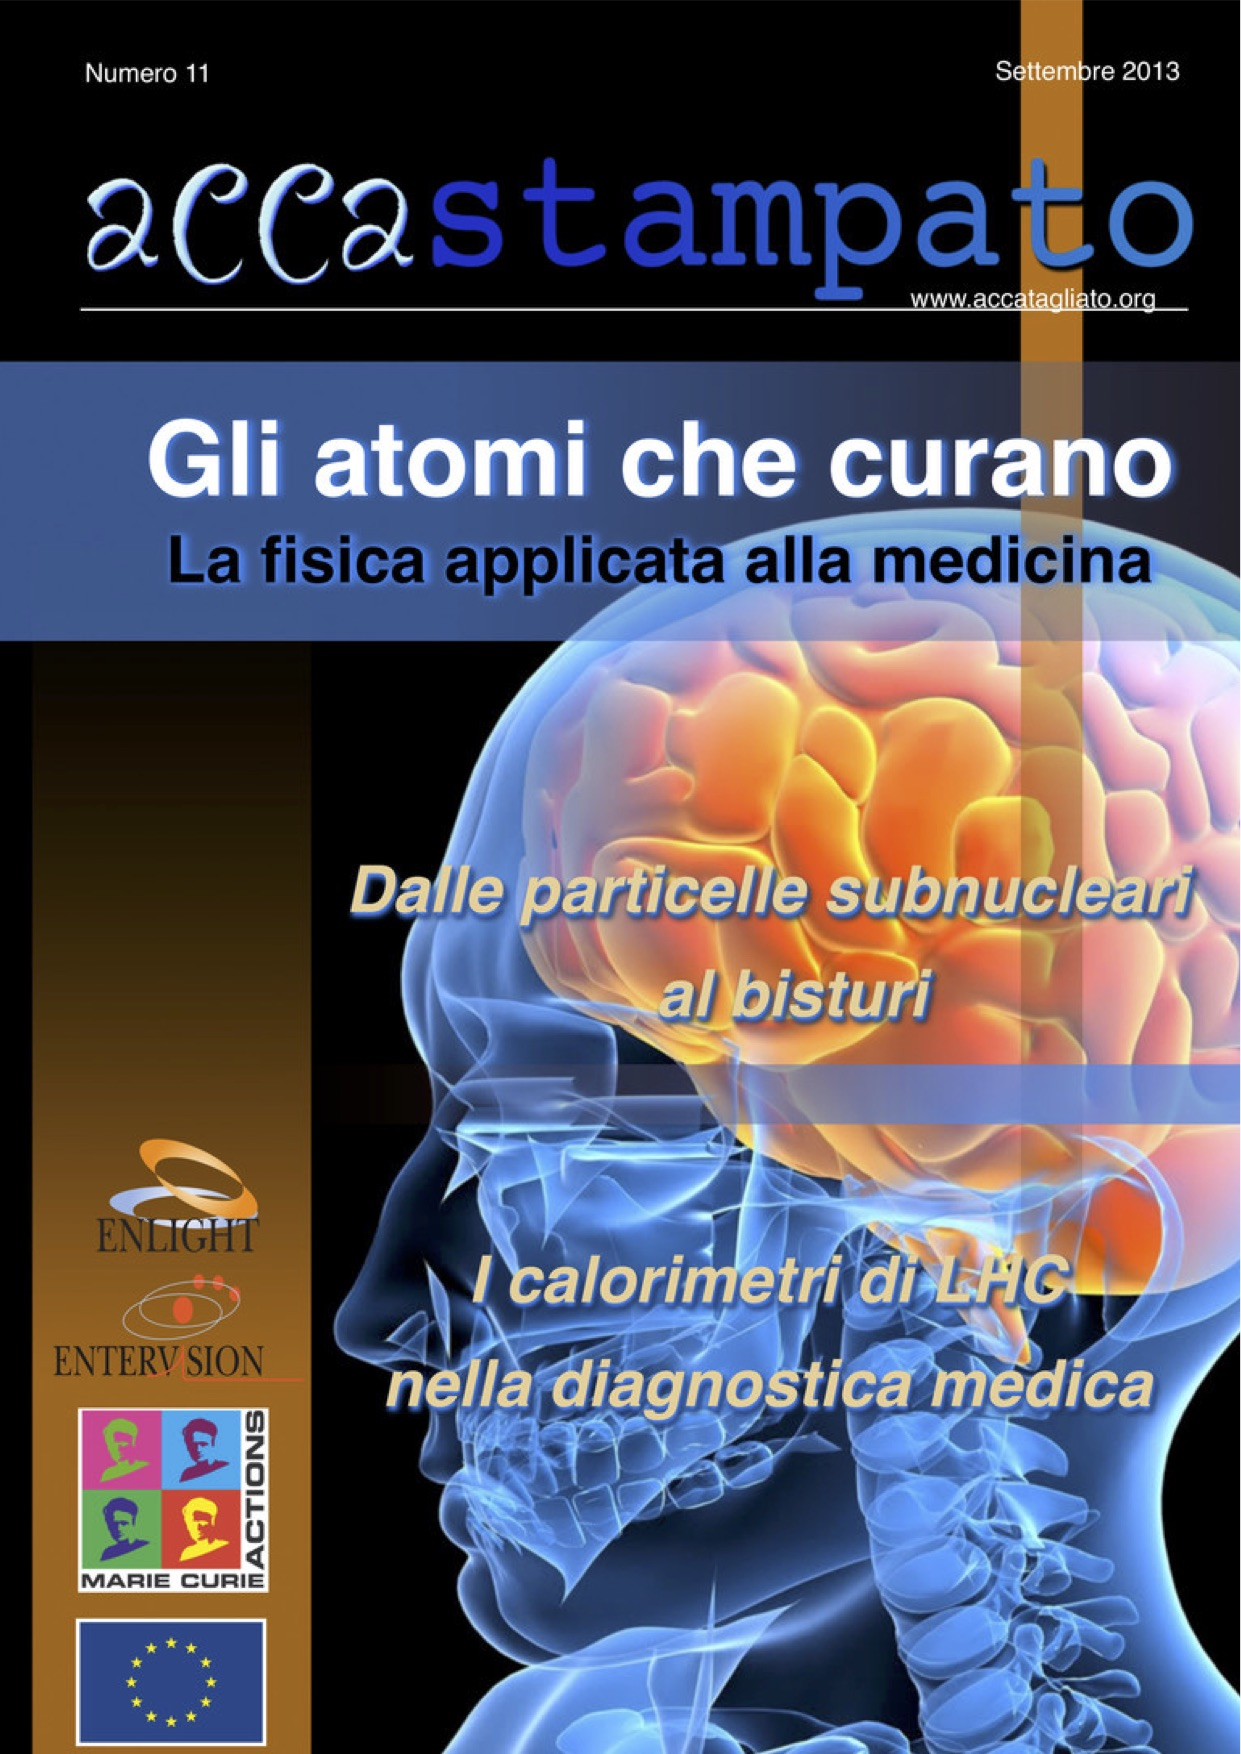 undicesimo numero (in italiano)